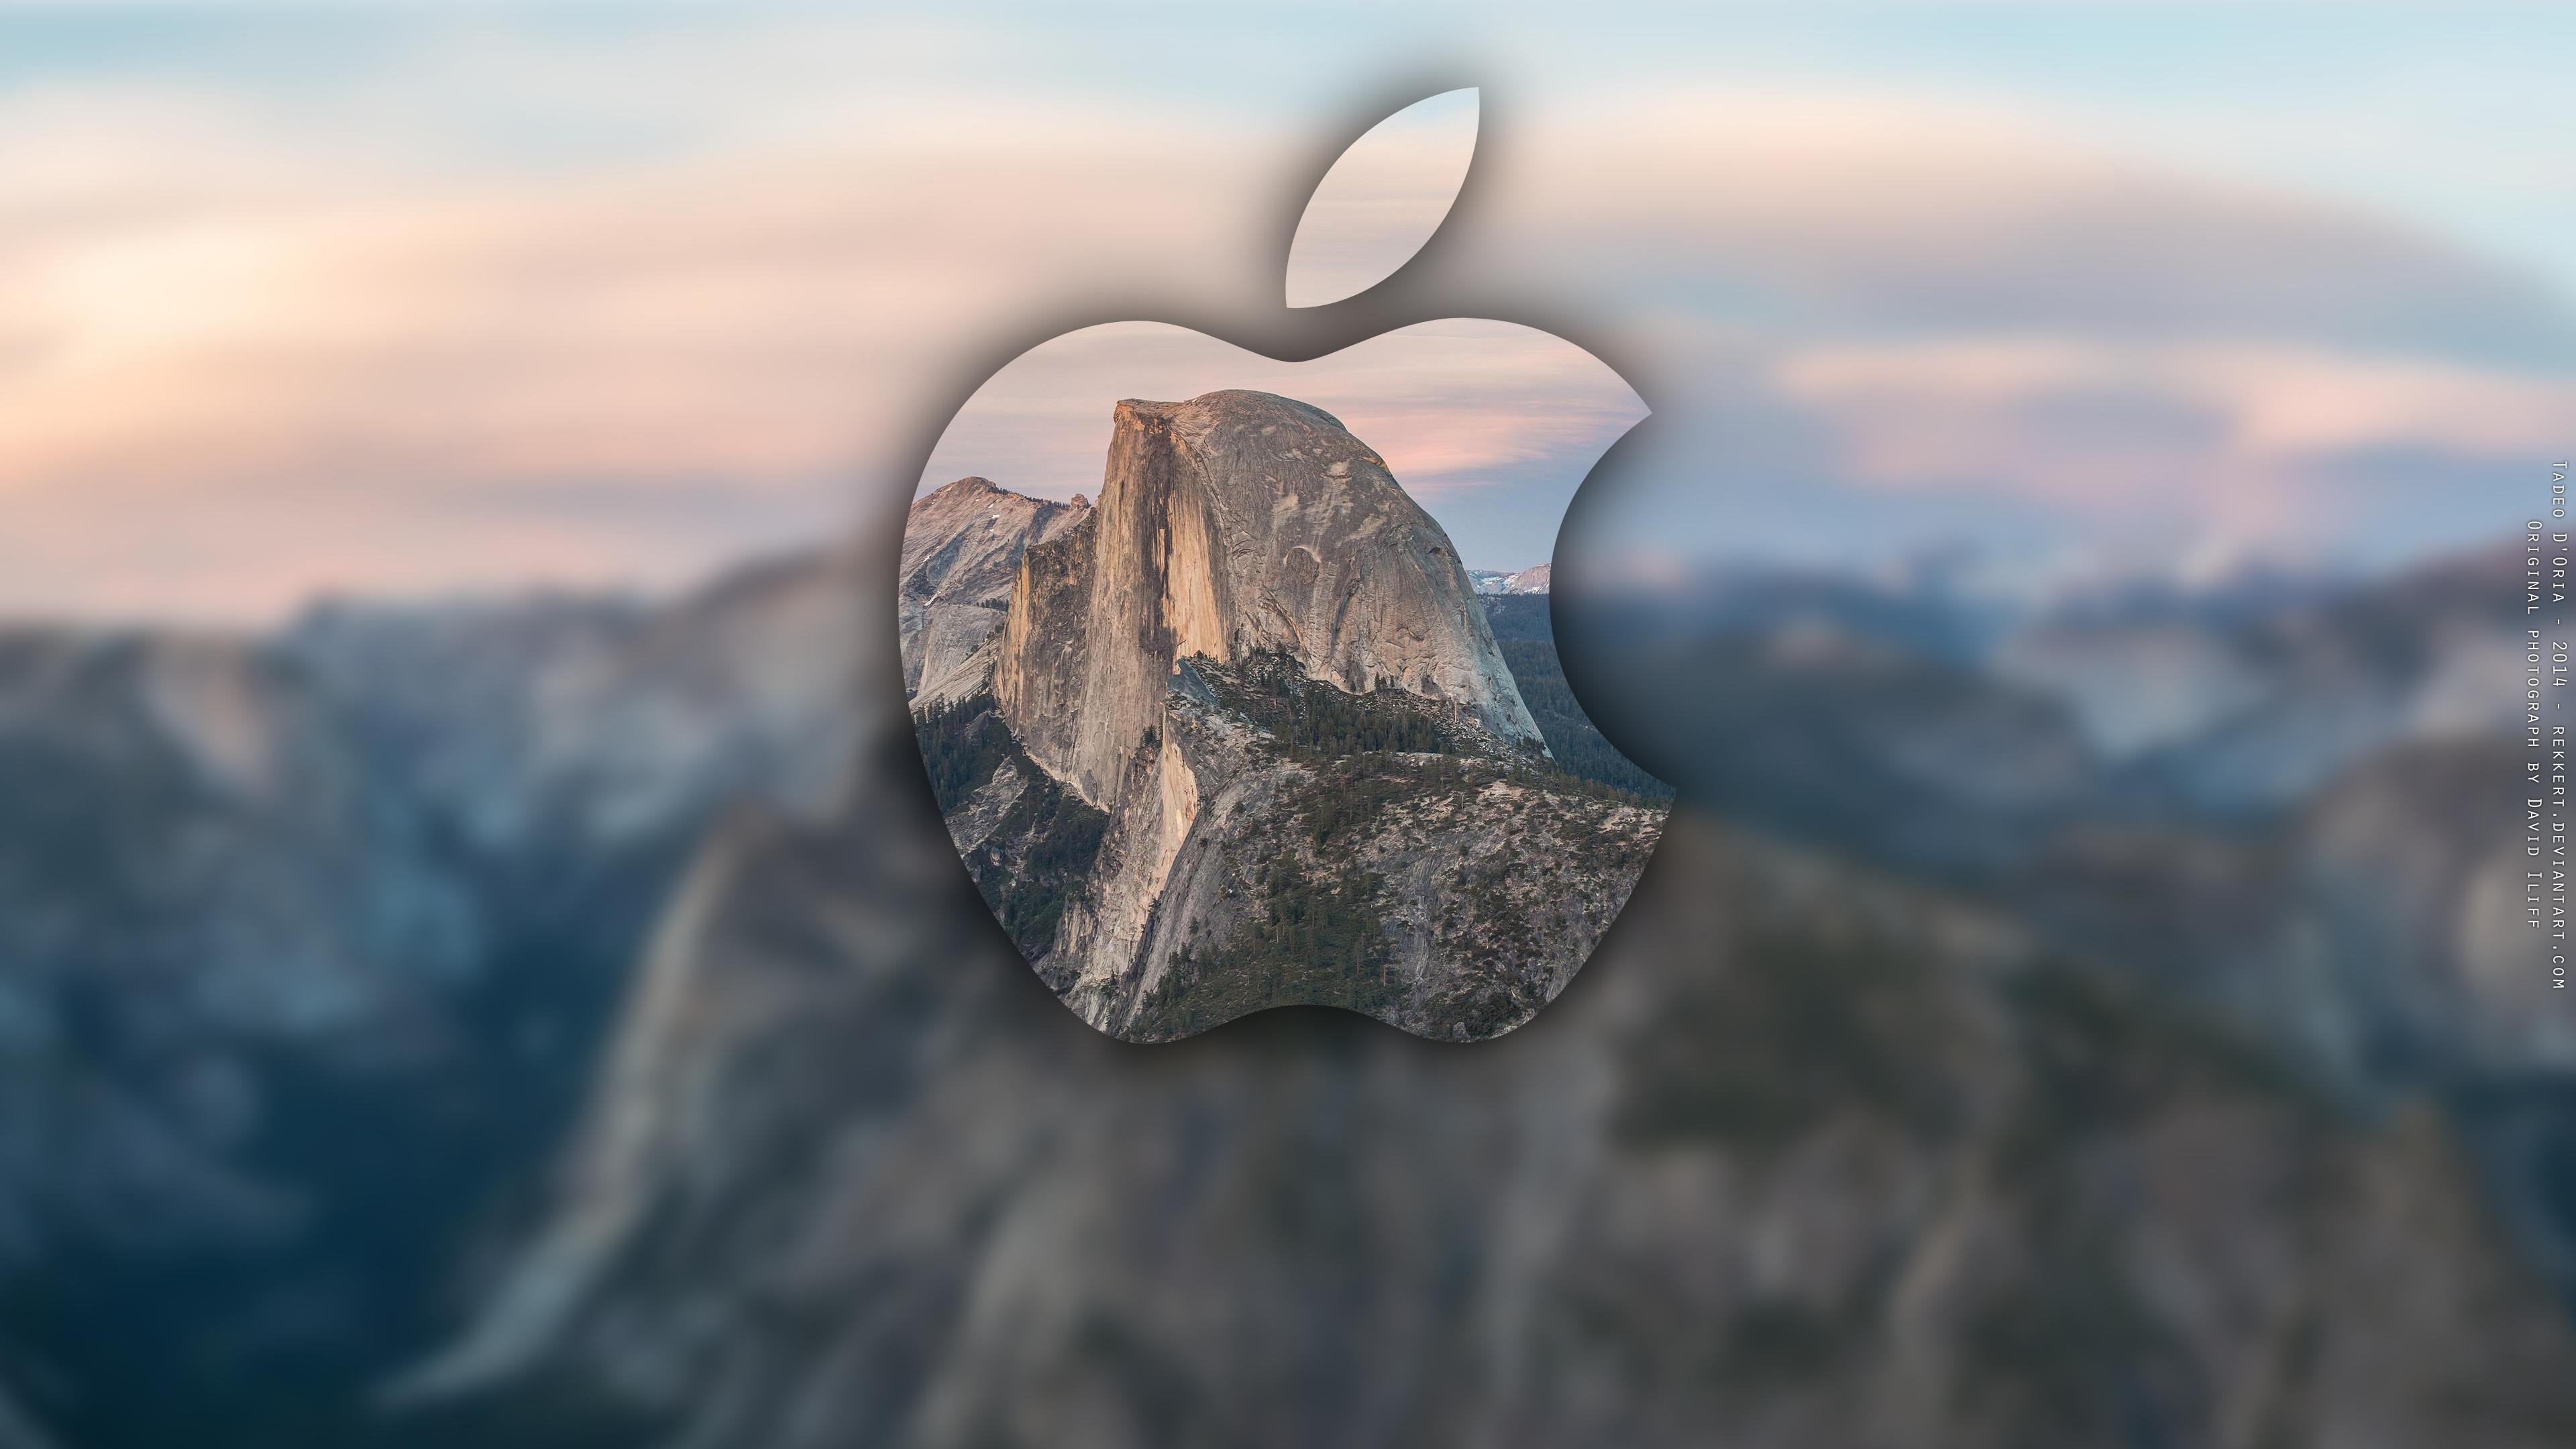 Mac Wallpapers Yosemite Wallpapers for Your OS X Yosemite Mac 3840x2160